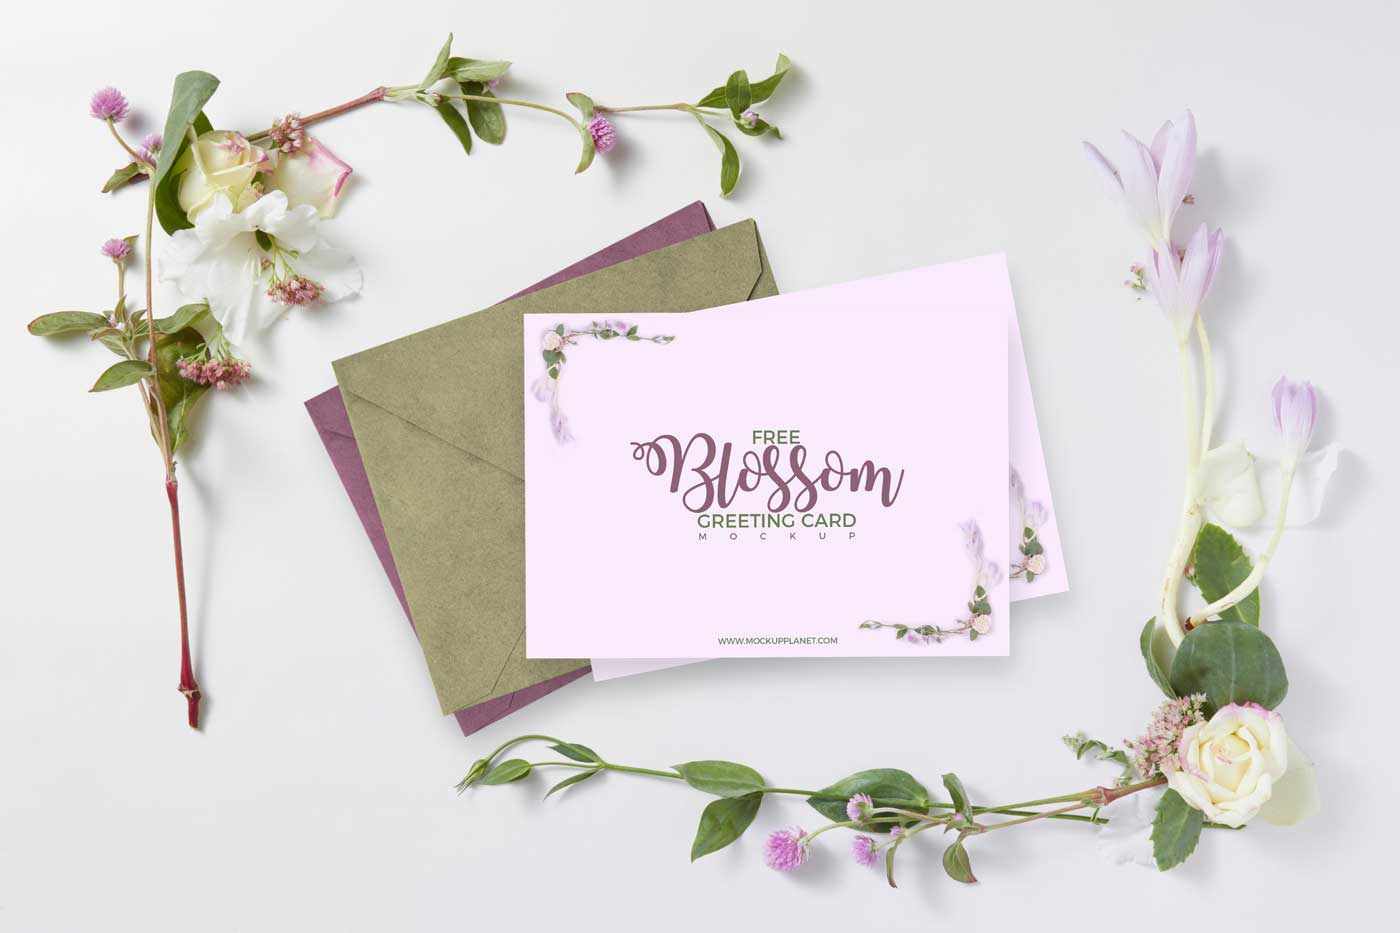 Blossom Greeting Card Free Mockup